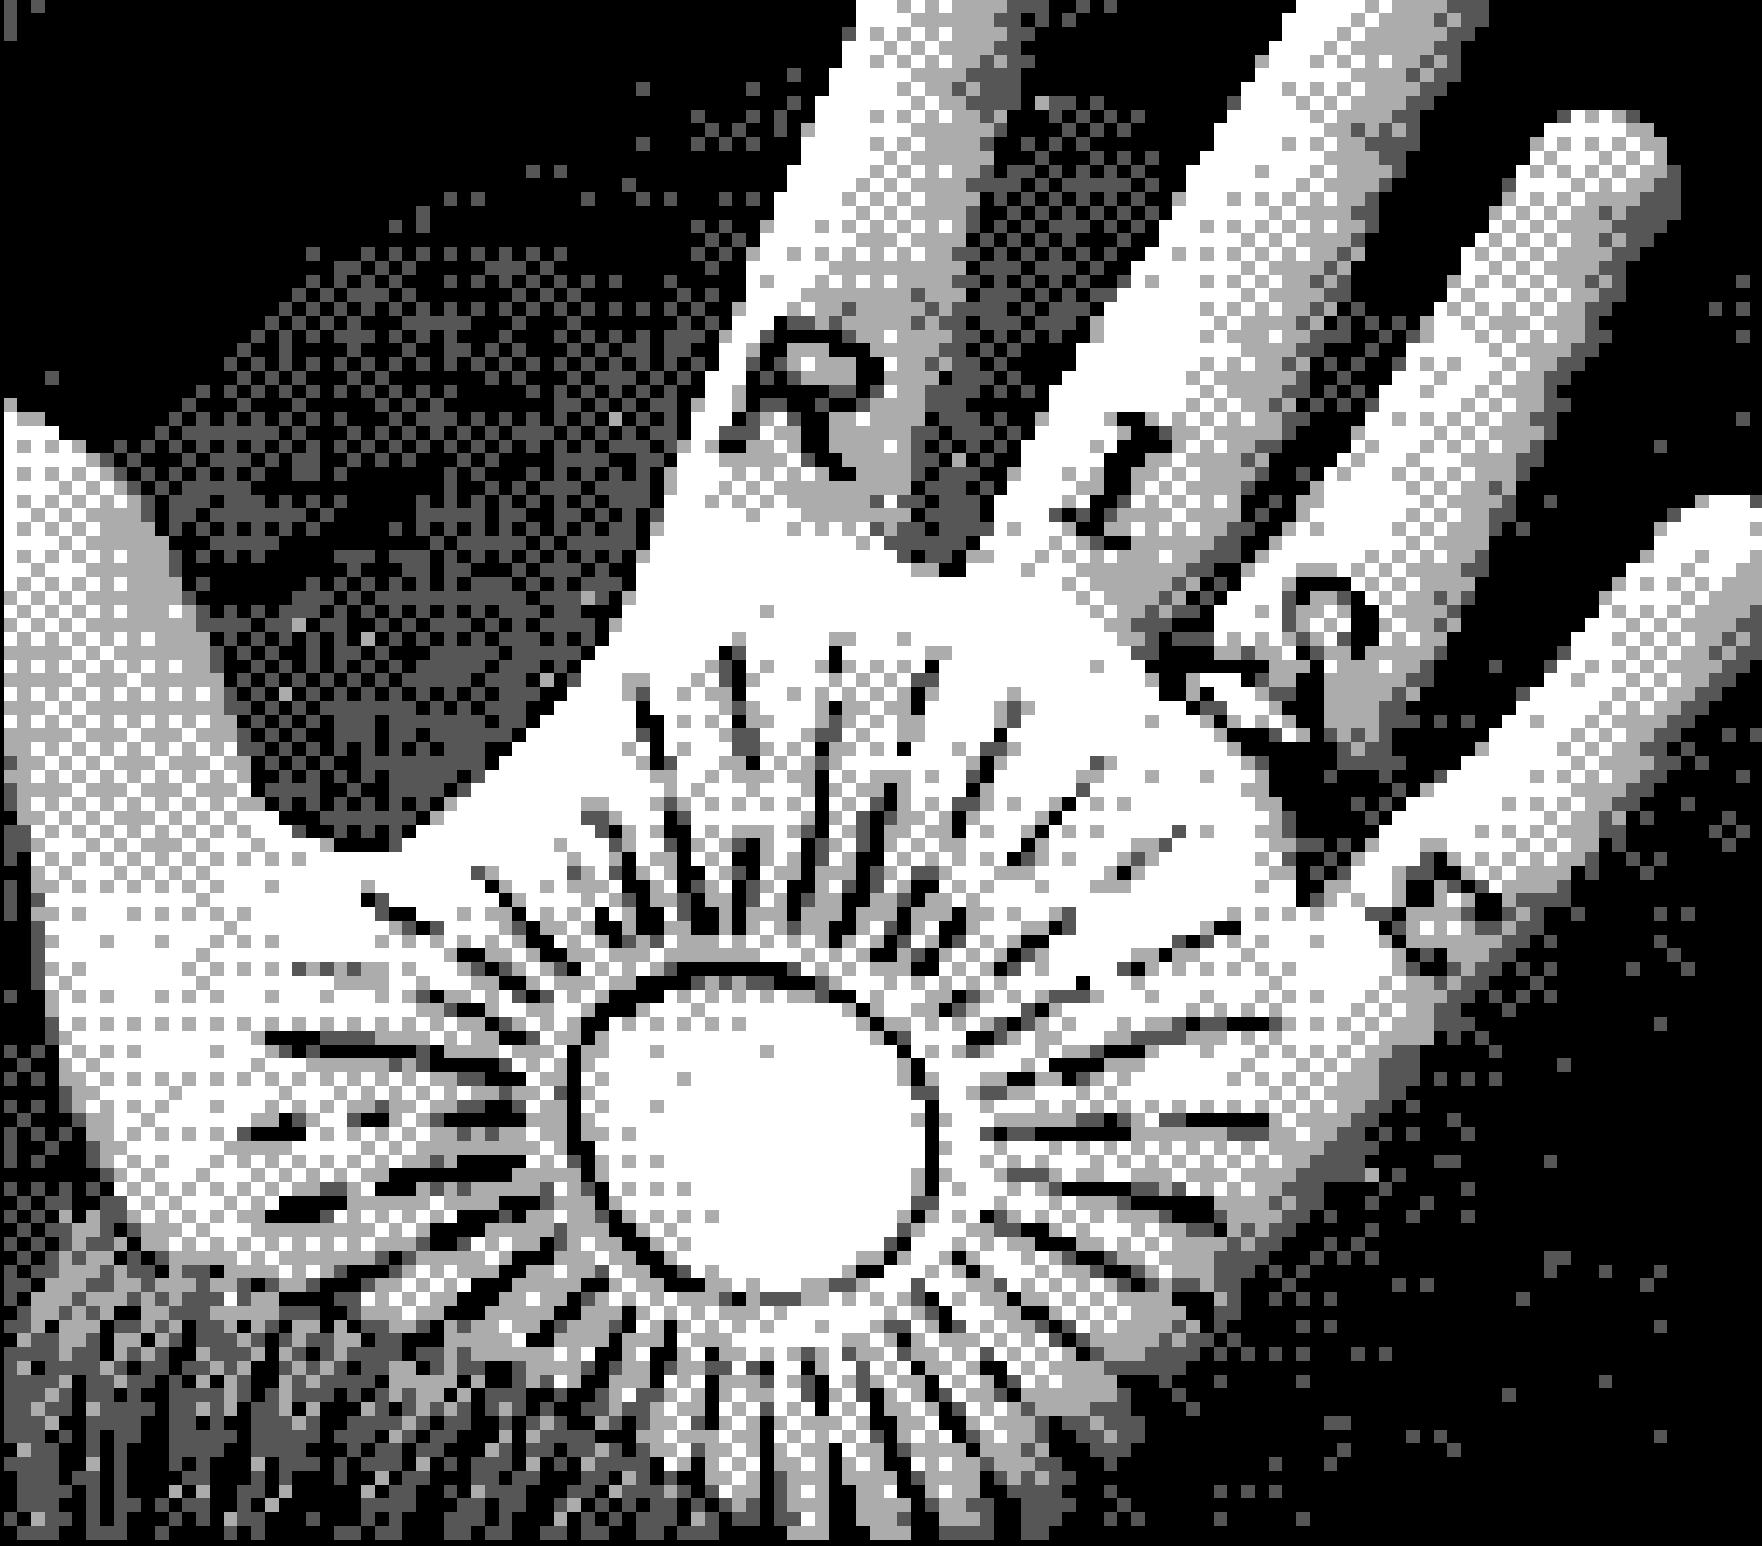 Game Boy Photo Tattoo